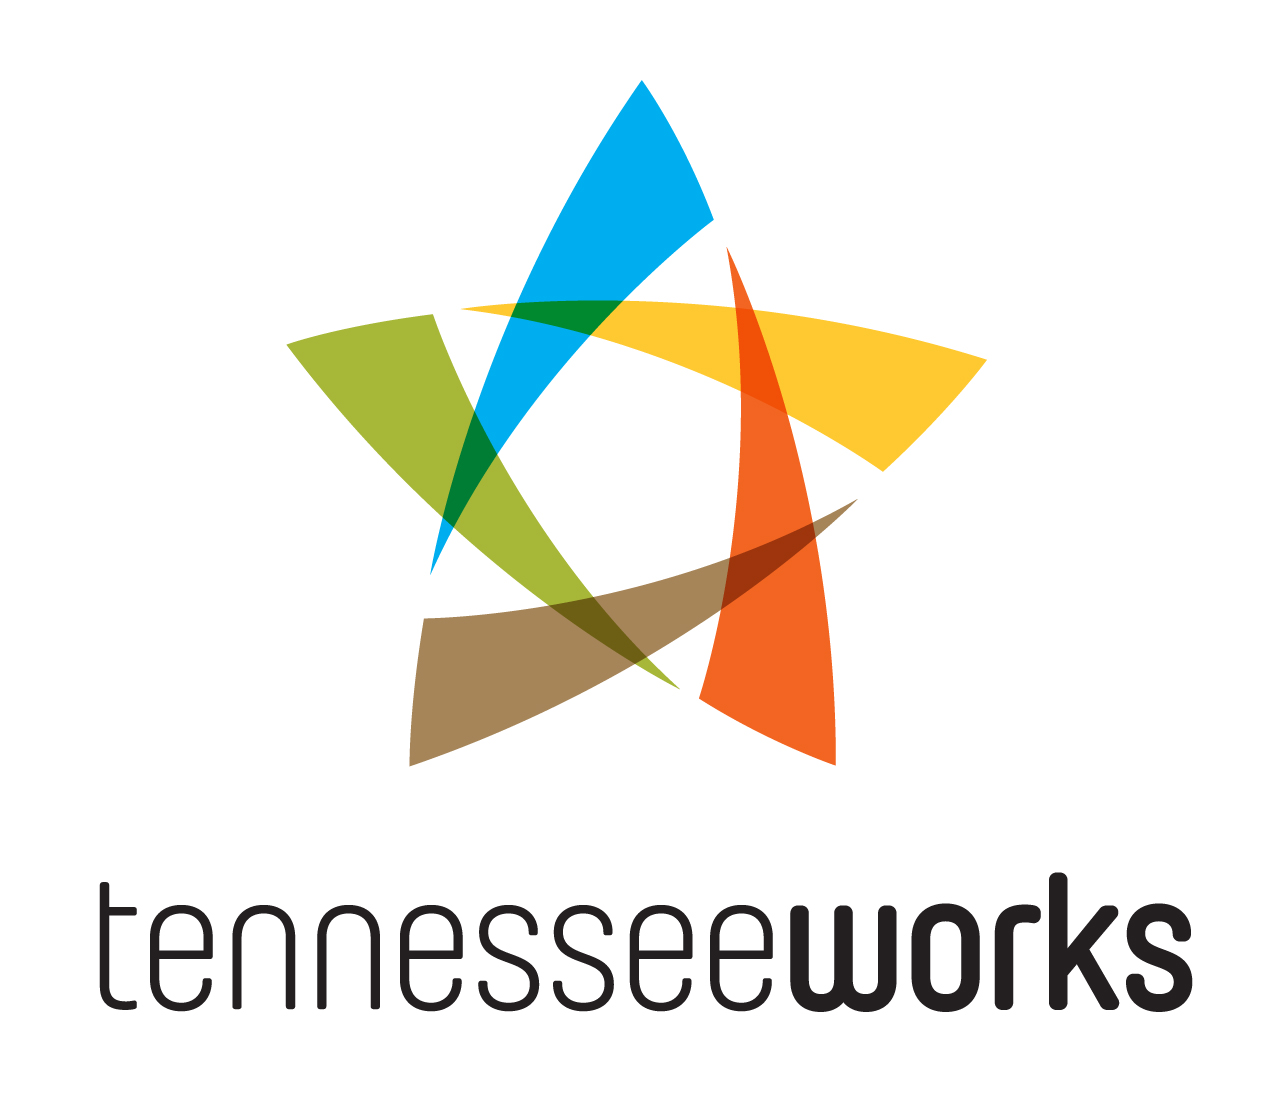 TNWRKS logo.jpg